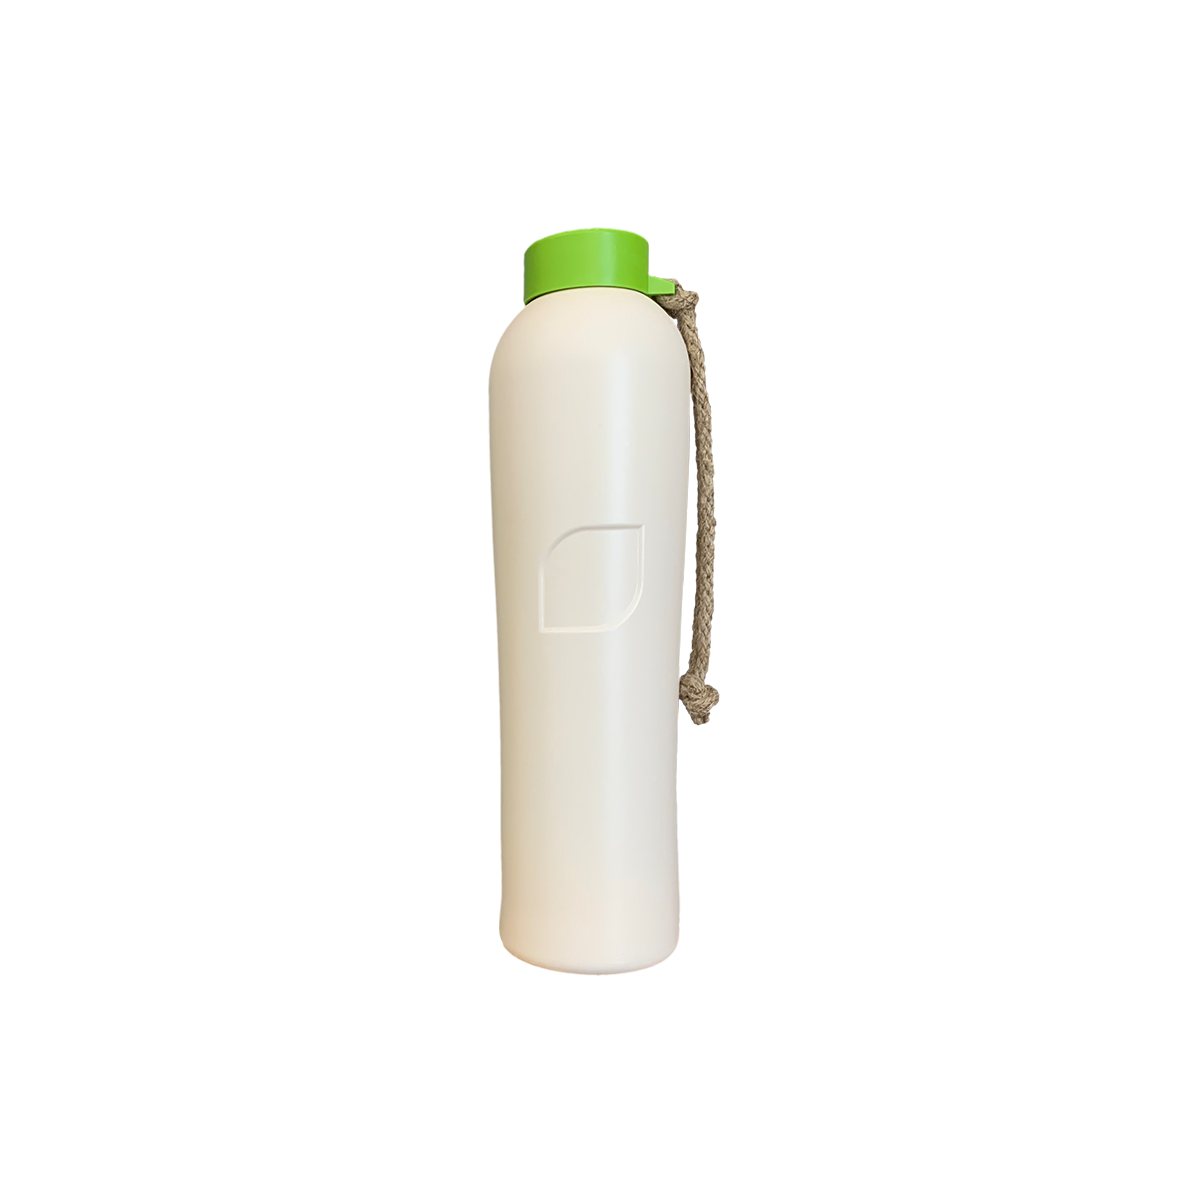 ajaa! PureKids Bottle, Grösse 0.8l